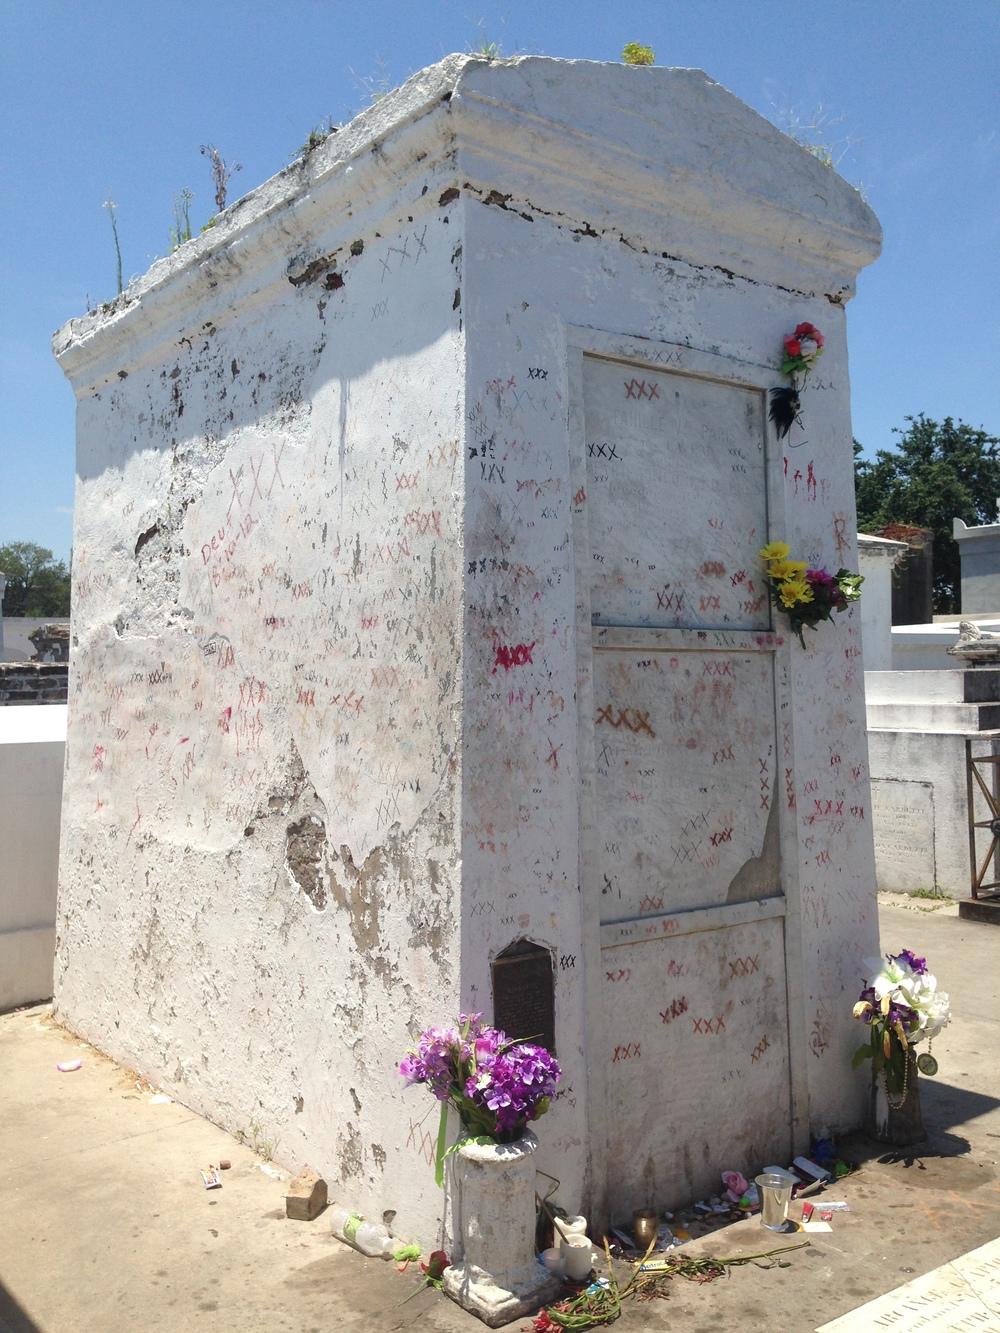 Marie Laveau tomb prior to renovation in Nov 2014